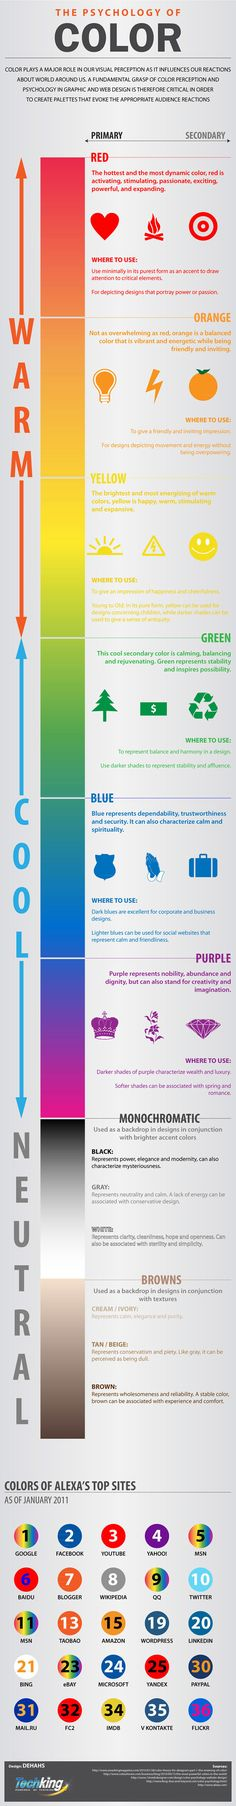 Phsychology of Color for web design